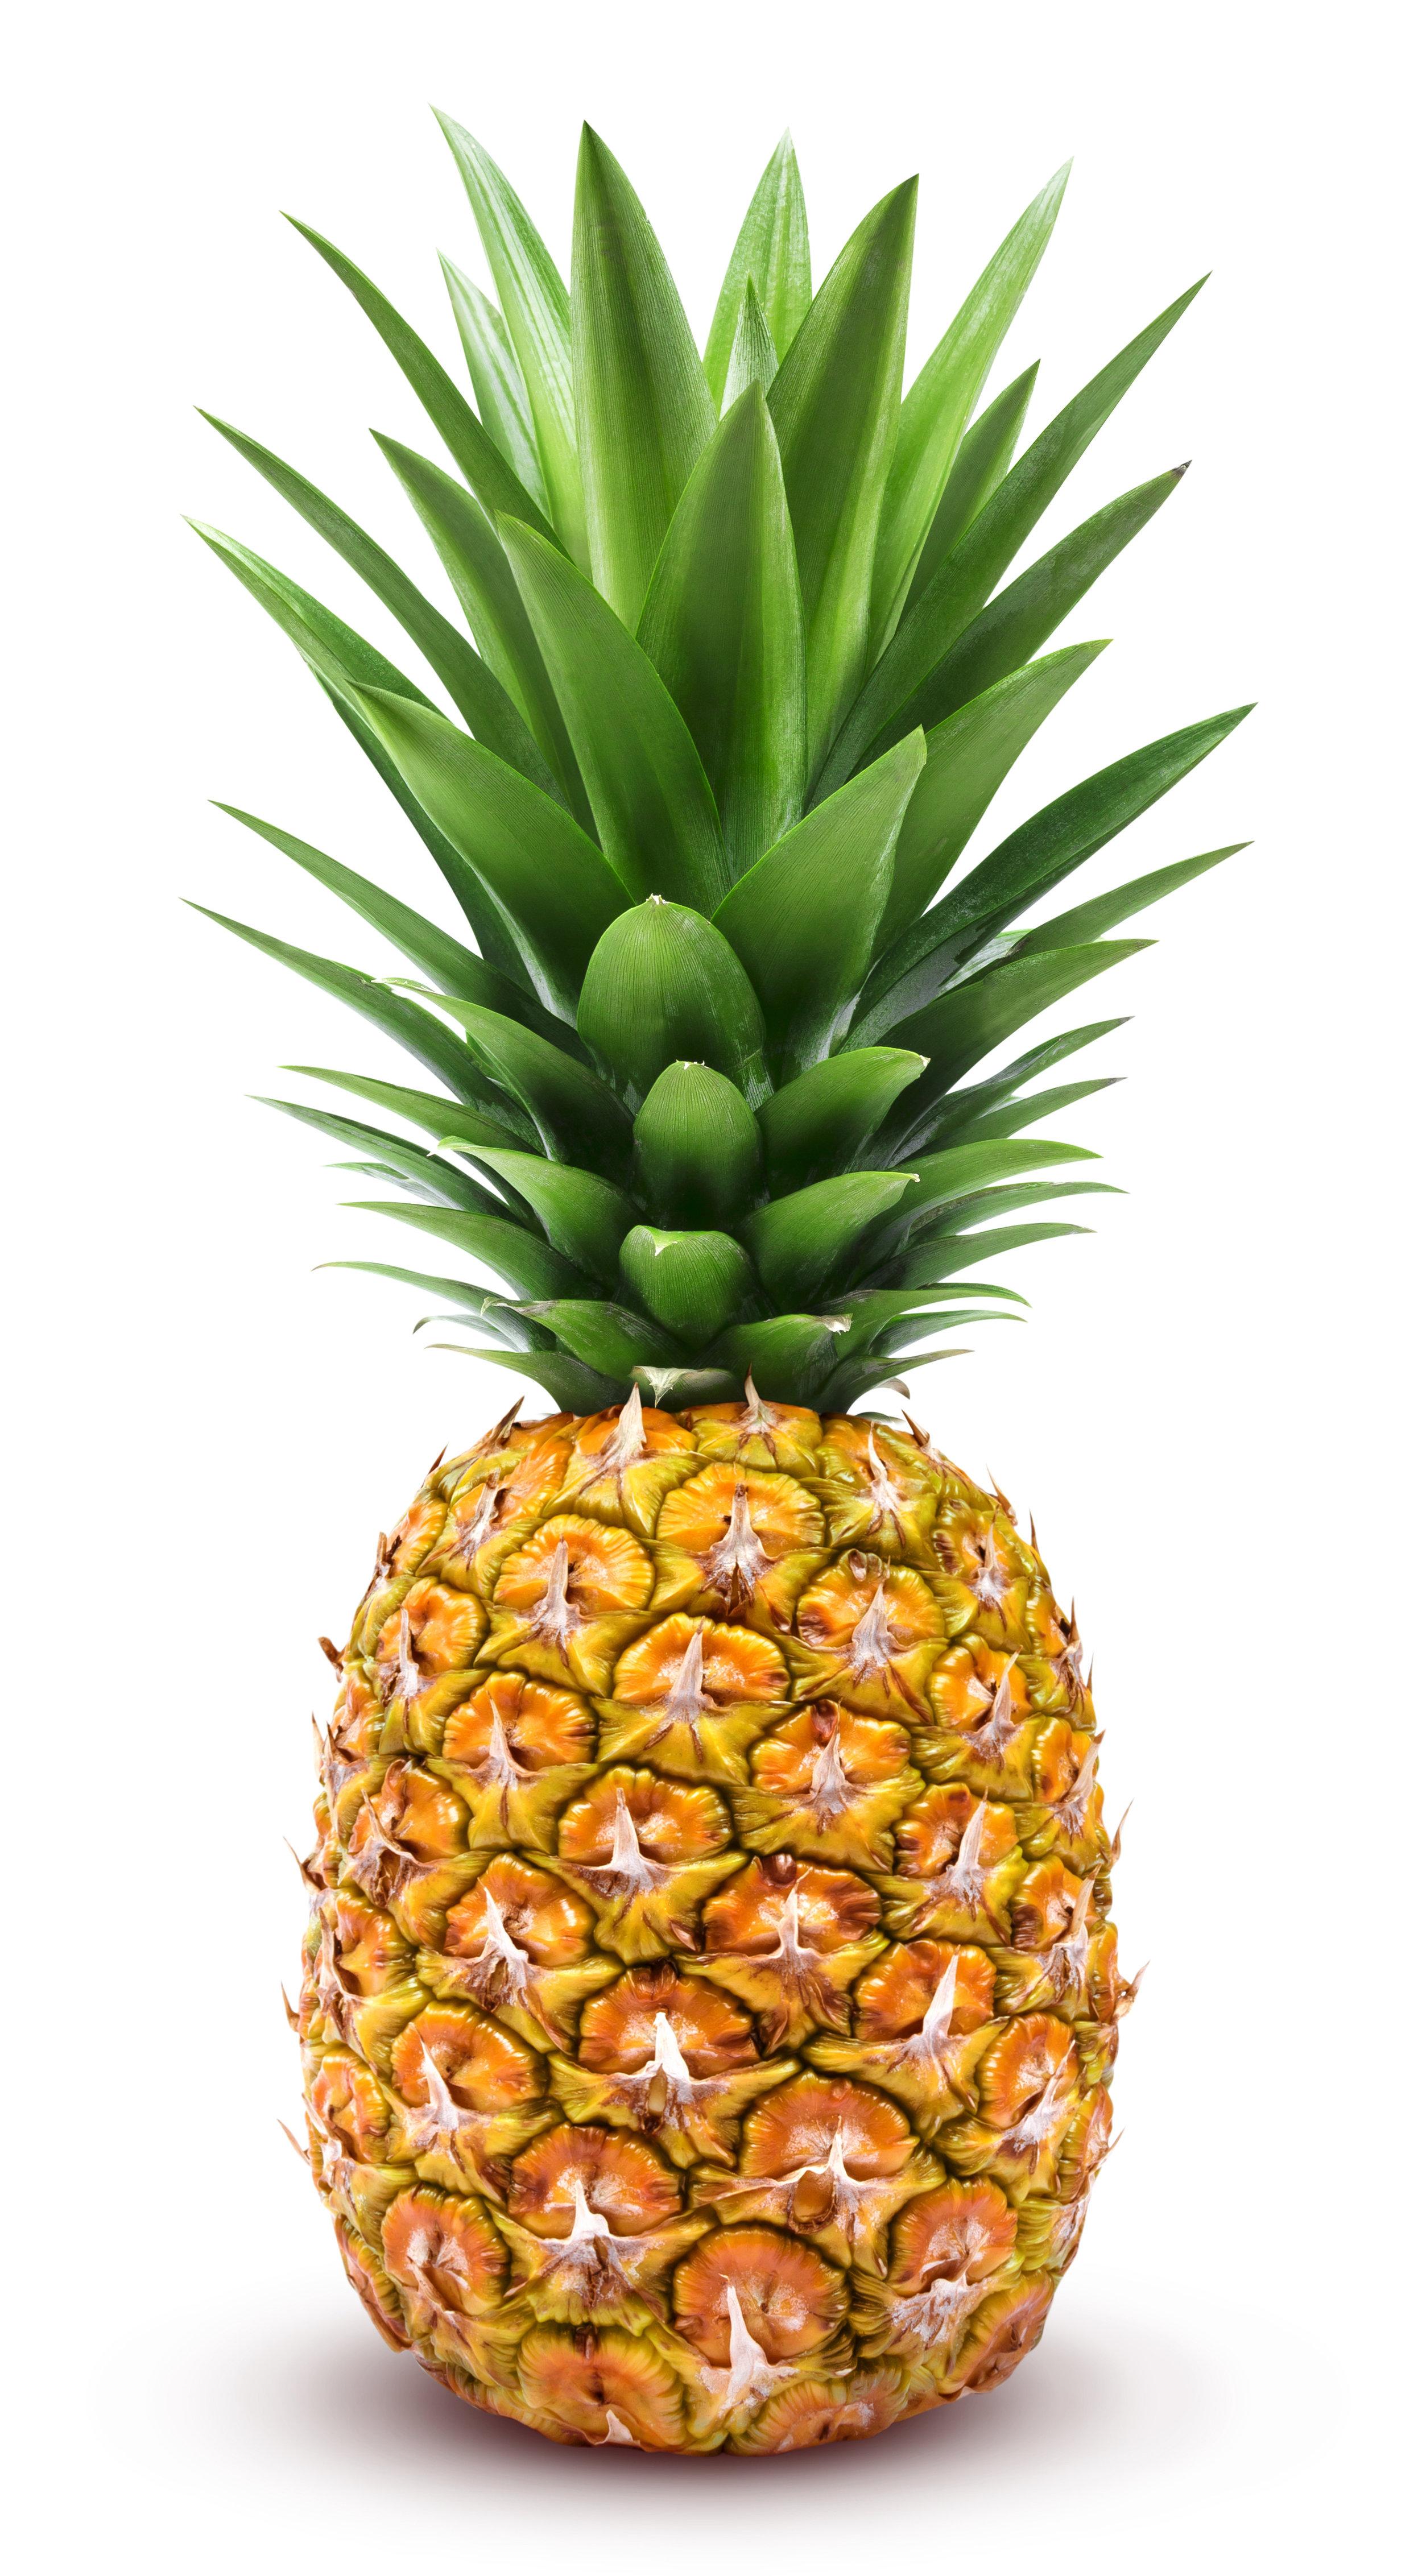 Emerging Pineapple Stock Photo.jpeg